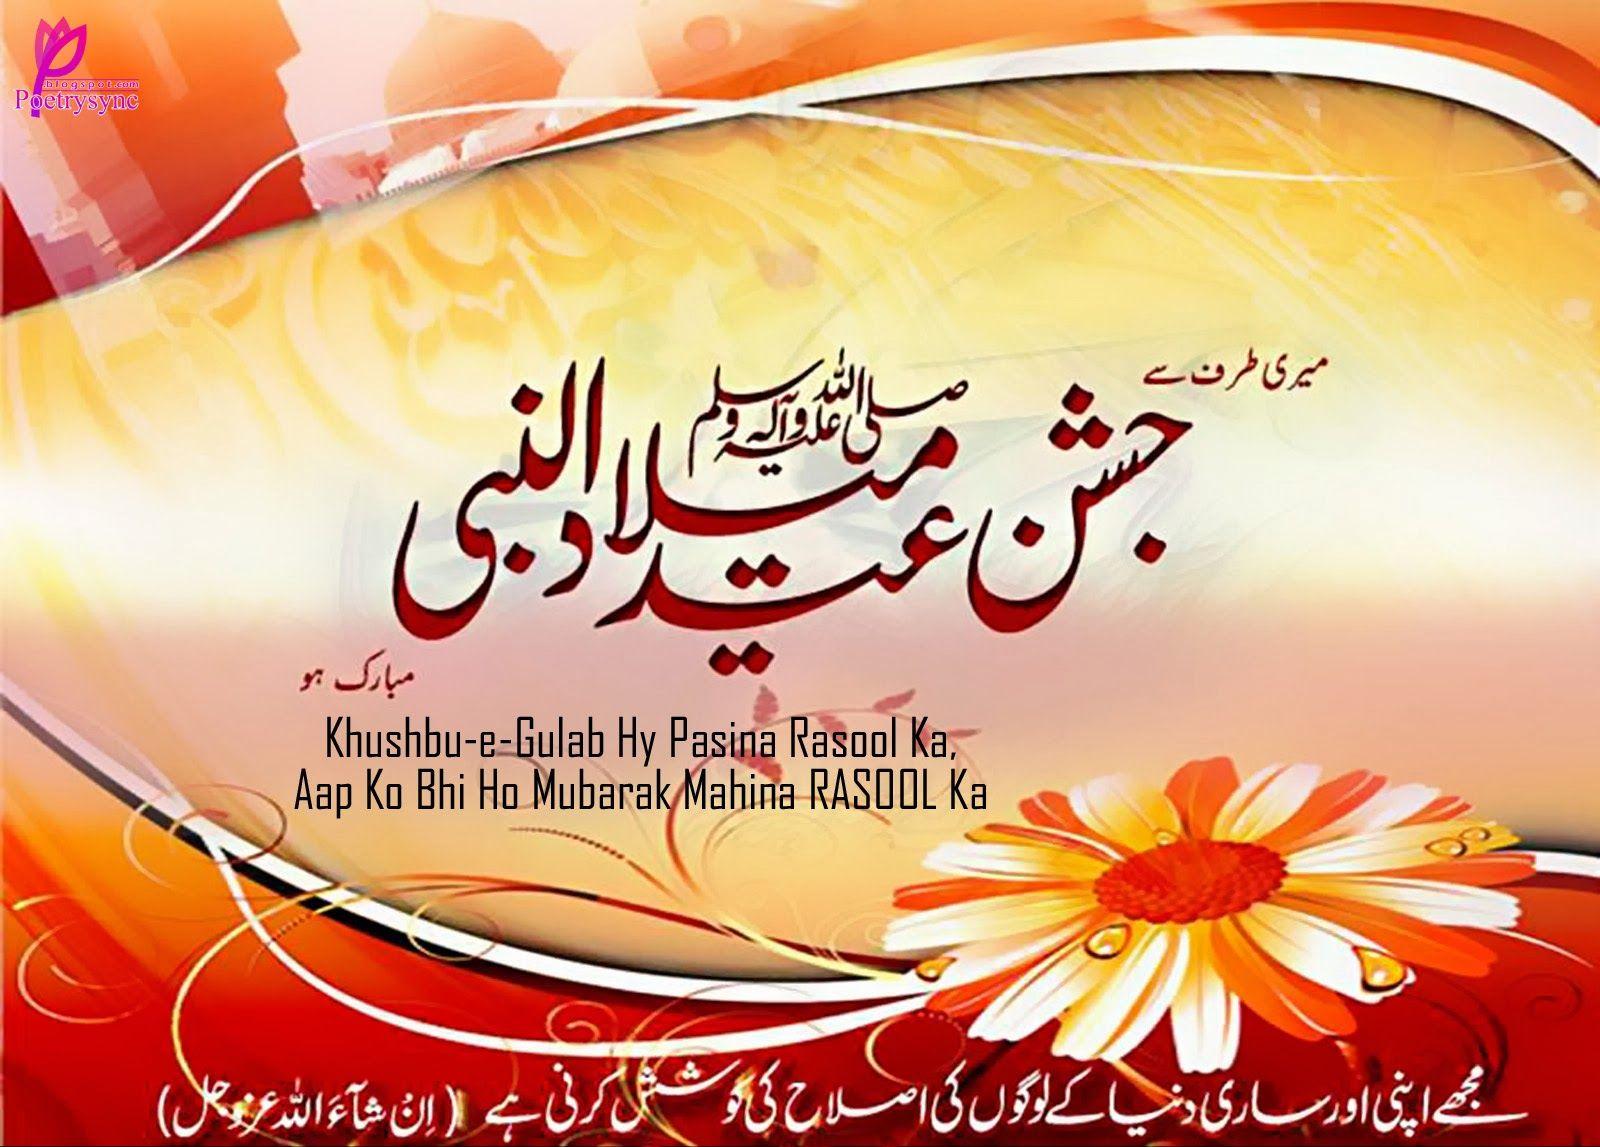 Jashan-e-Eid-Milad-un-Nabi Mubarak Picture andd Wishes